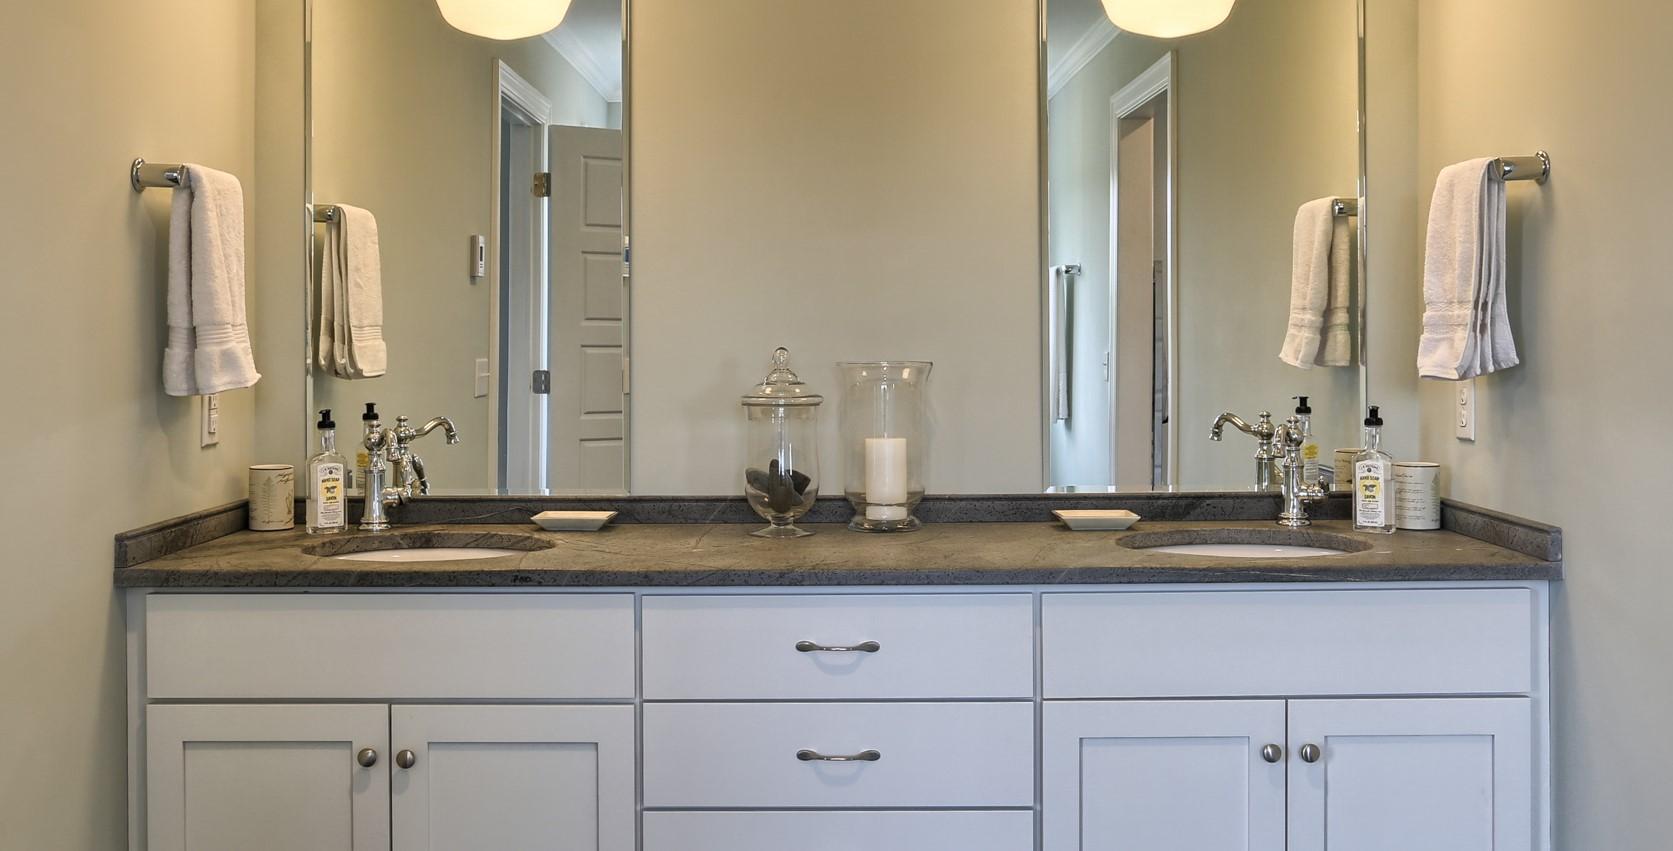 Universal Design for the Bathroom image 1